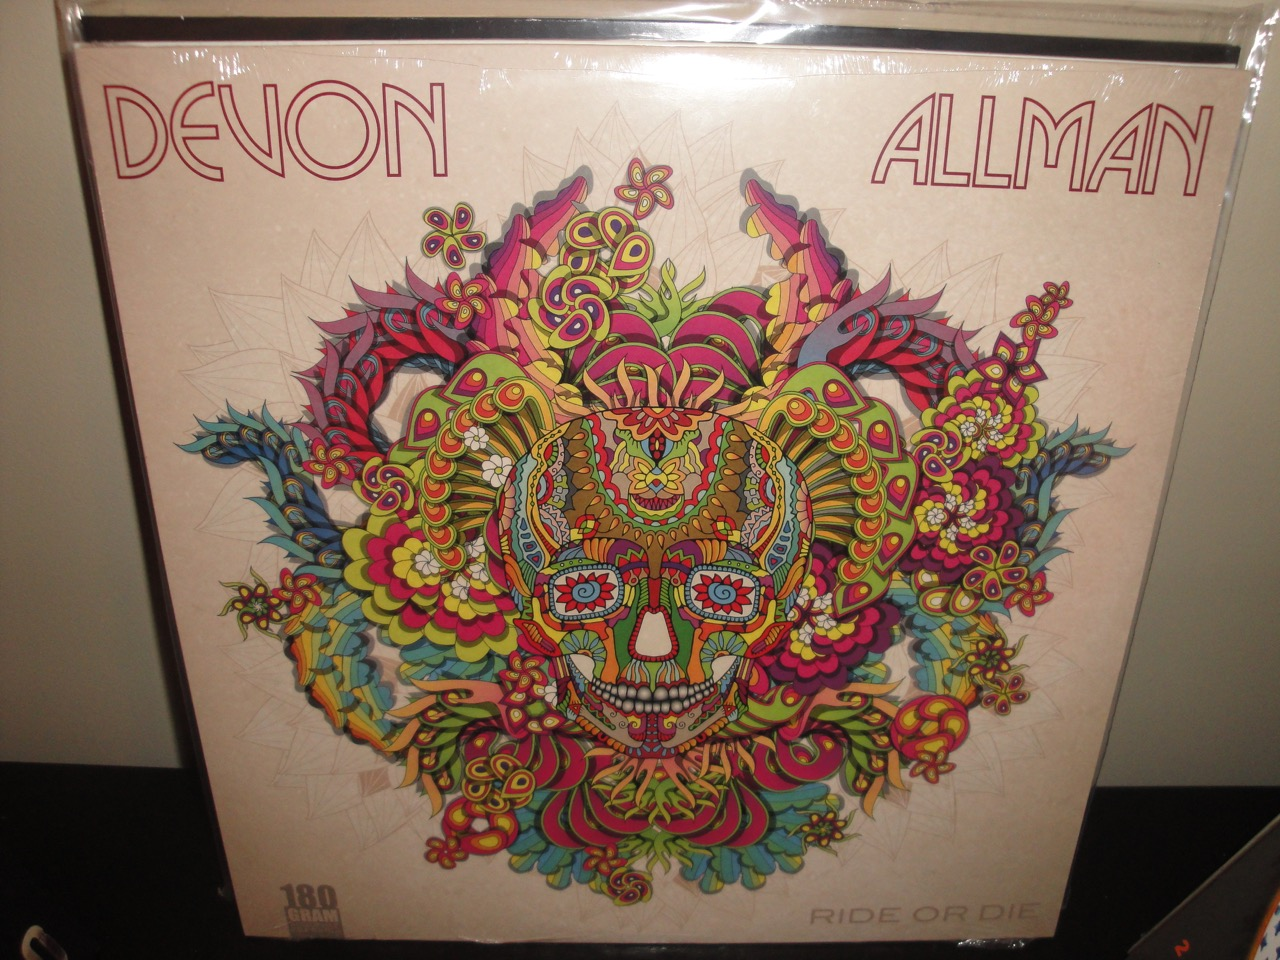 Devon Allman Vinyl